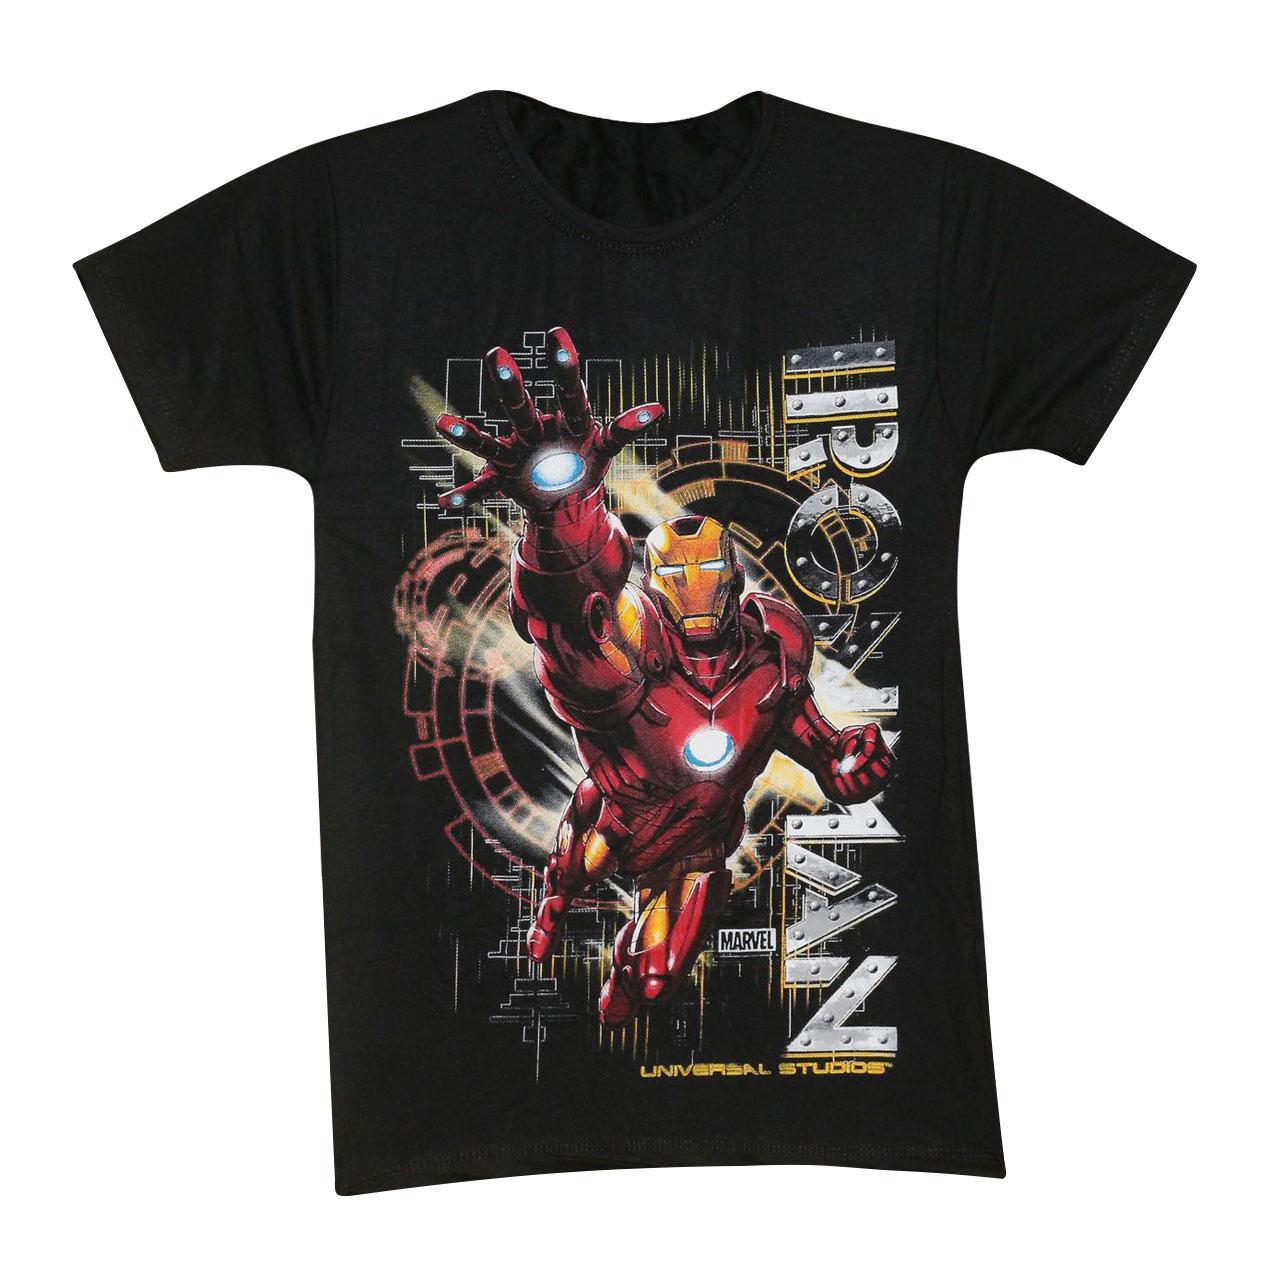 تی شرت پسرانه طرح آیرون من کد 32